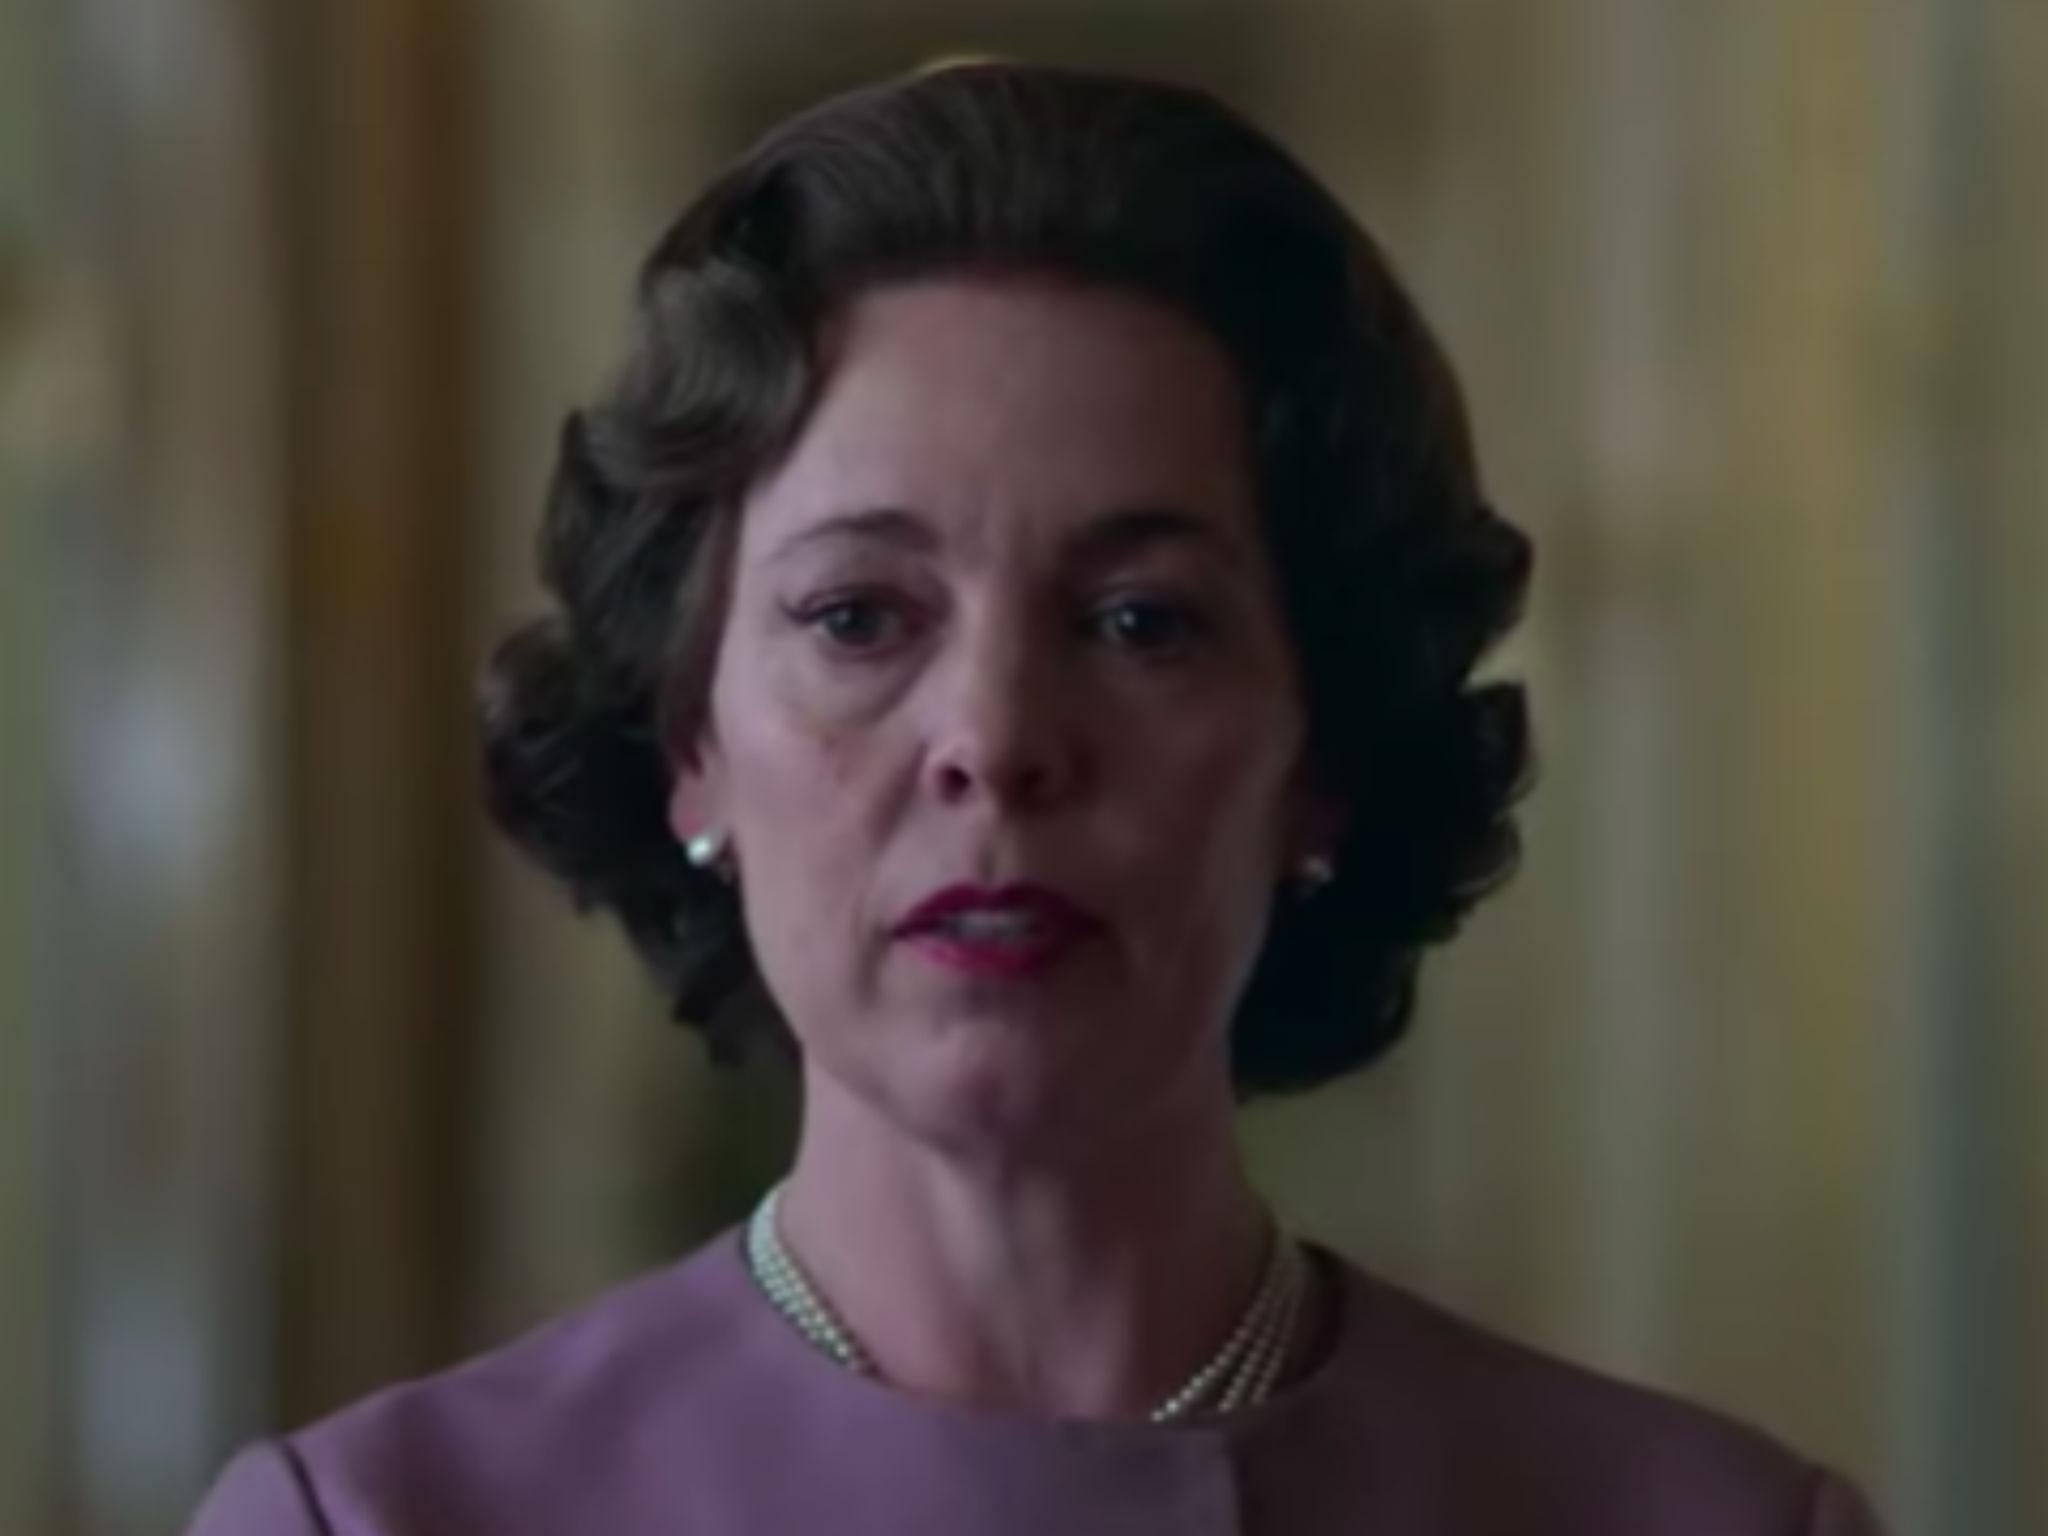 The Crown season 3 trailer: Olivia Colman makes Queen Elizabeth debut in first teaser